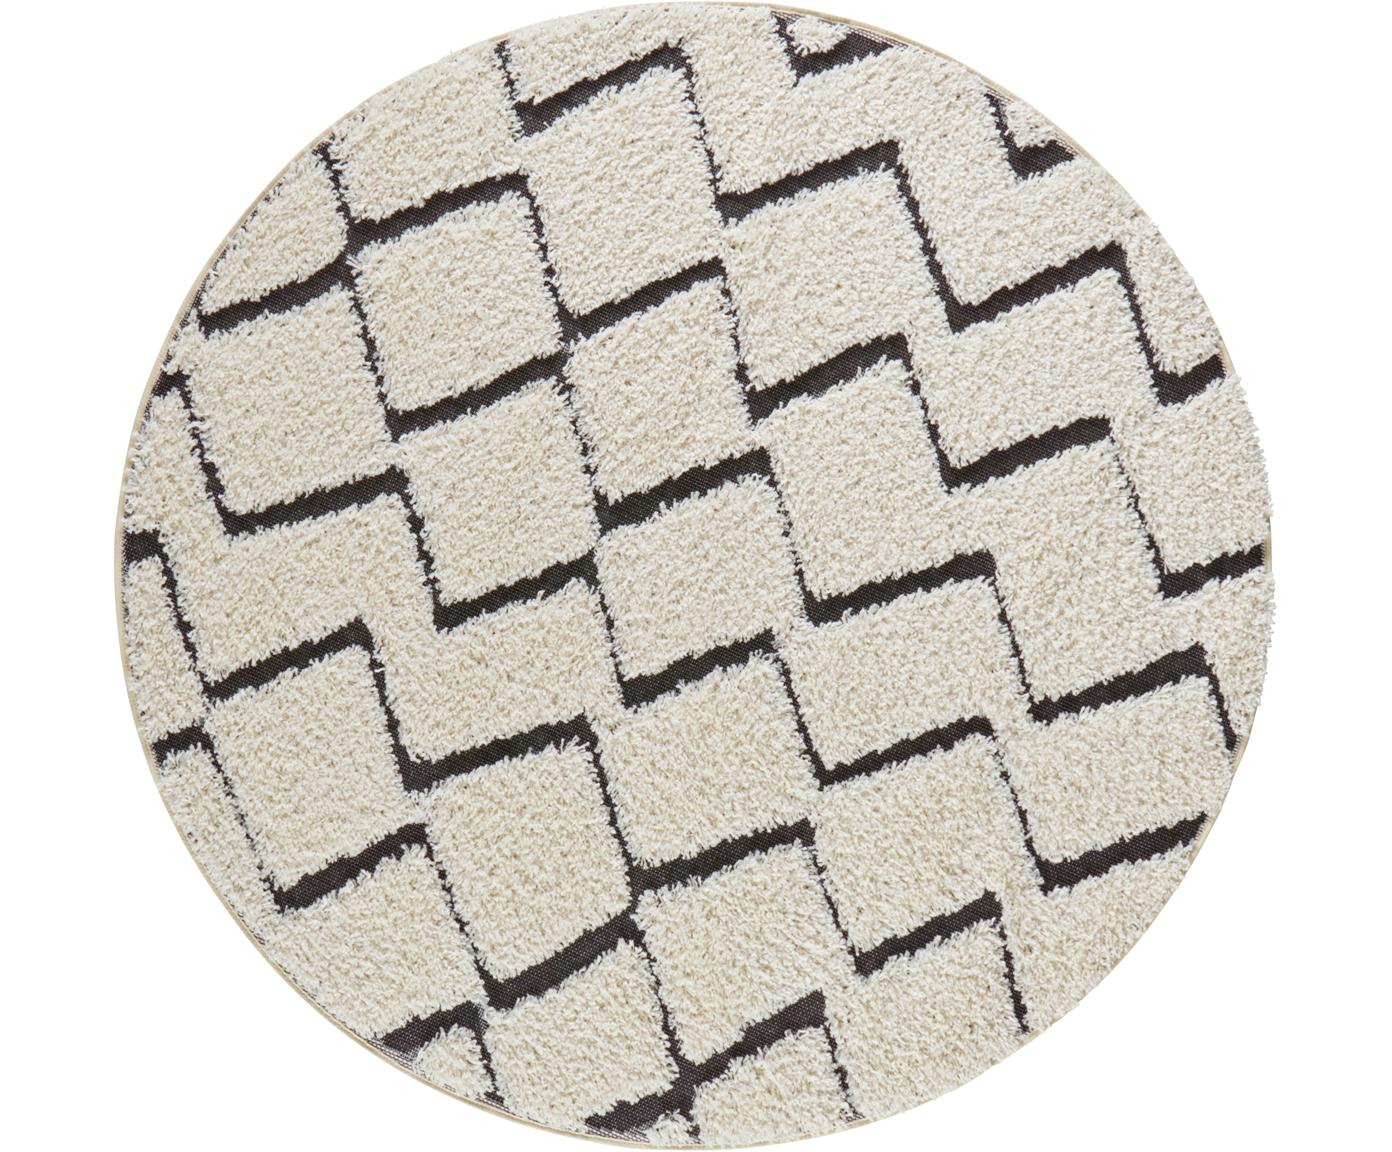 Rond vloerkleed Dades met hoog-laag patroon, Polypropyleen, Crèmekleurig, zwart, Ø 160 cm